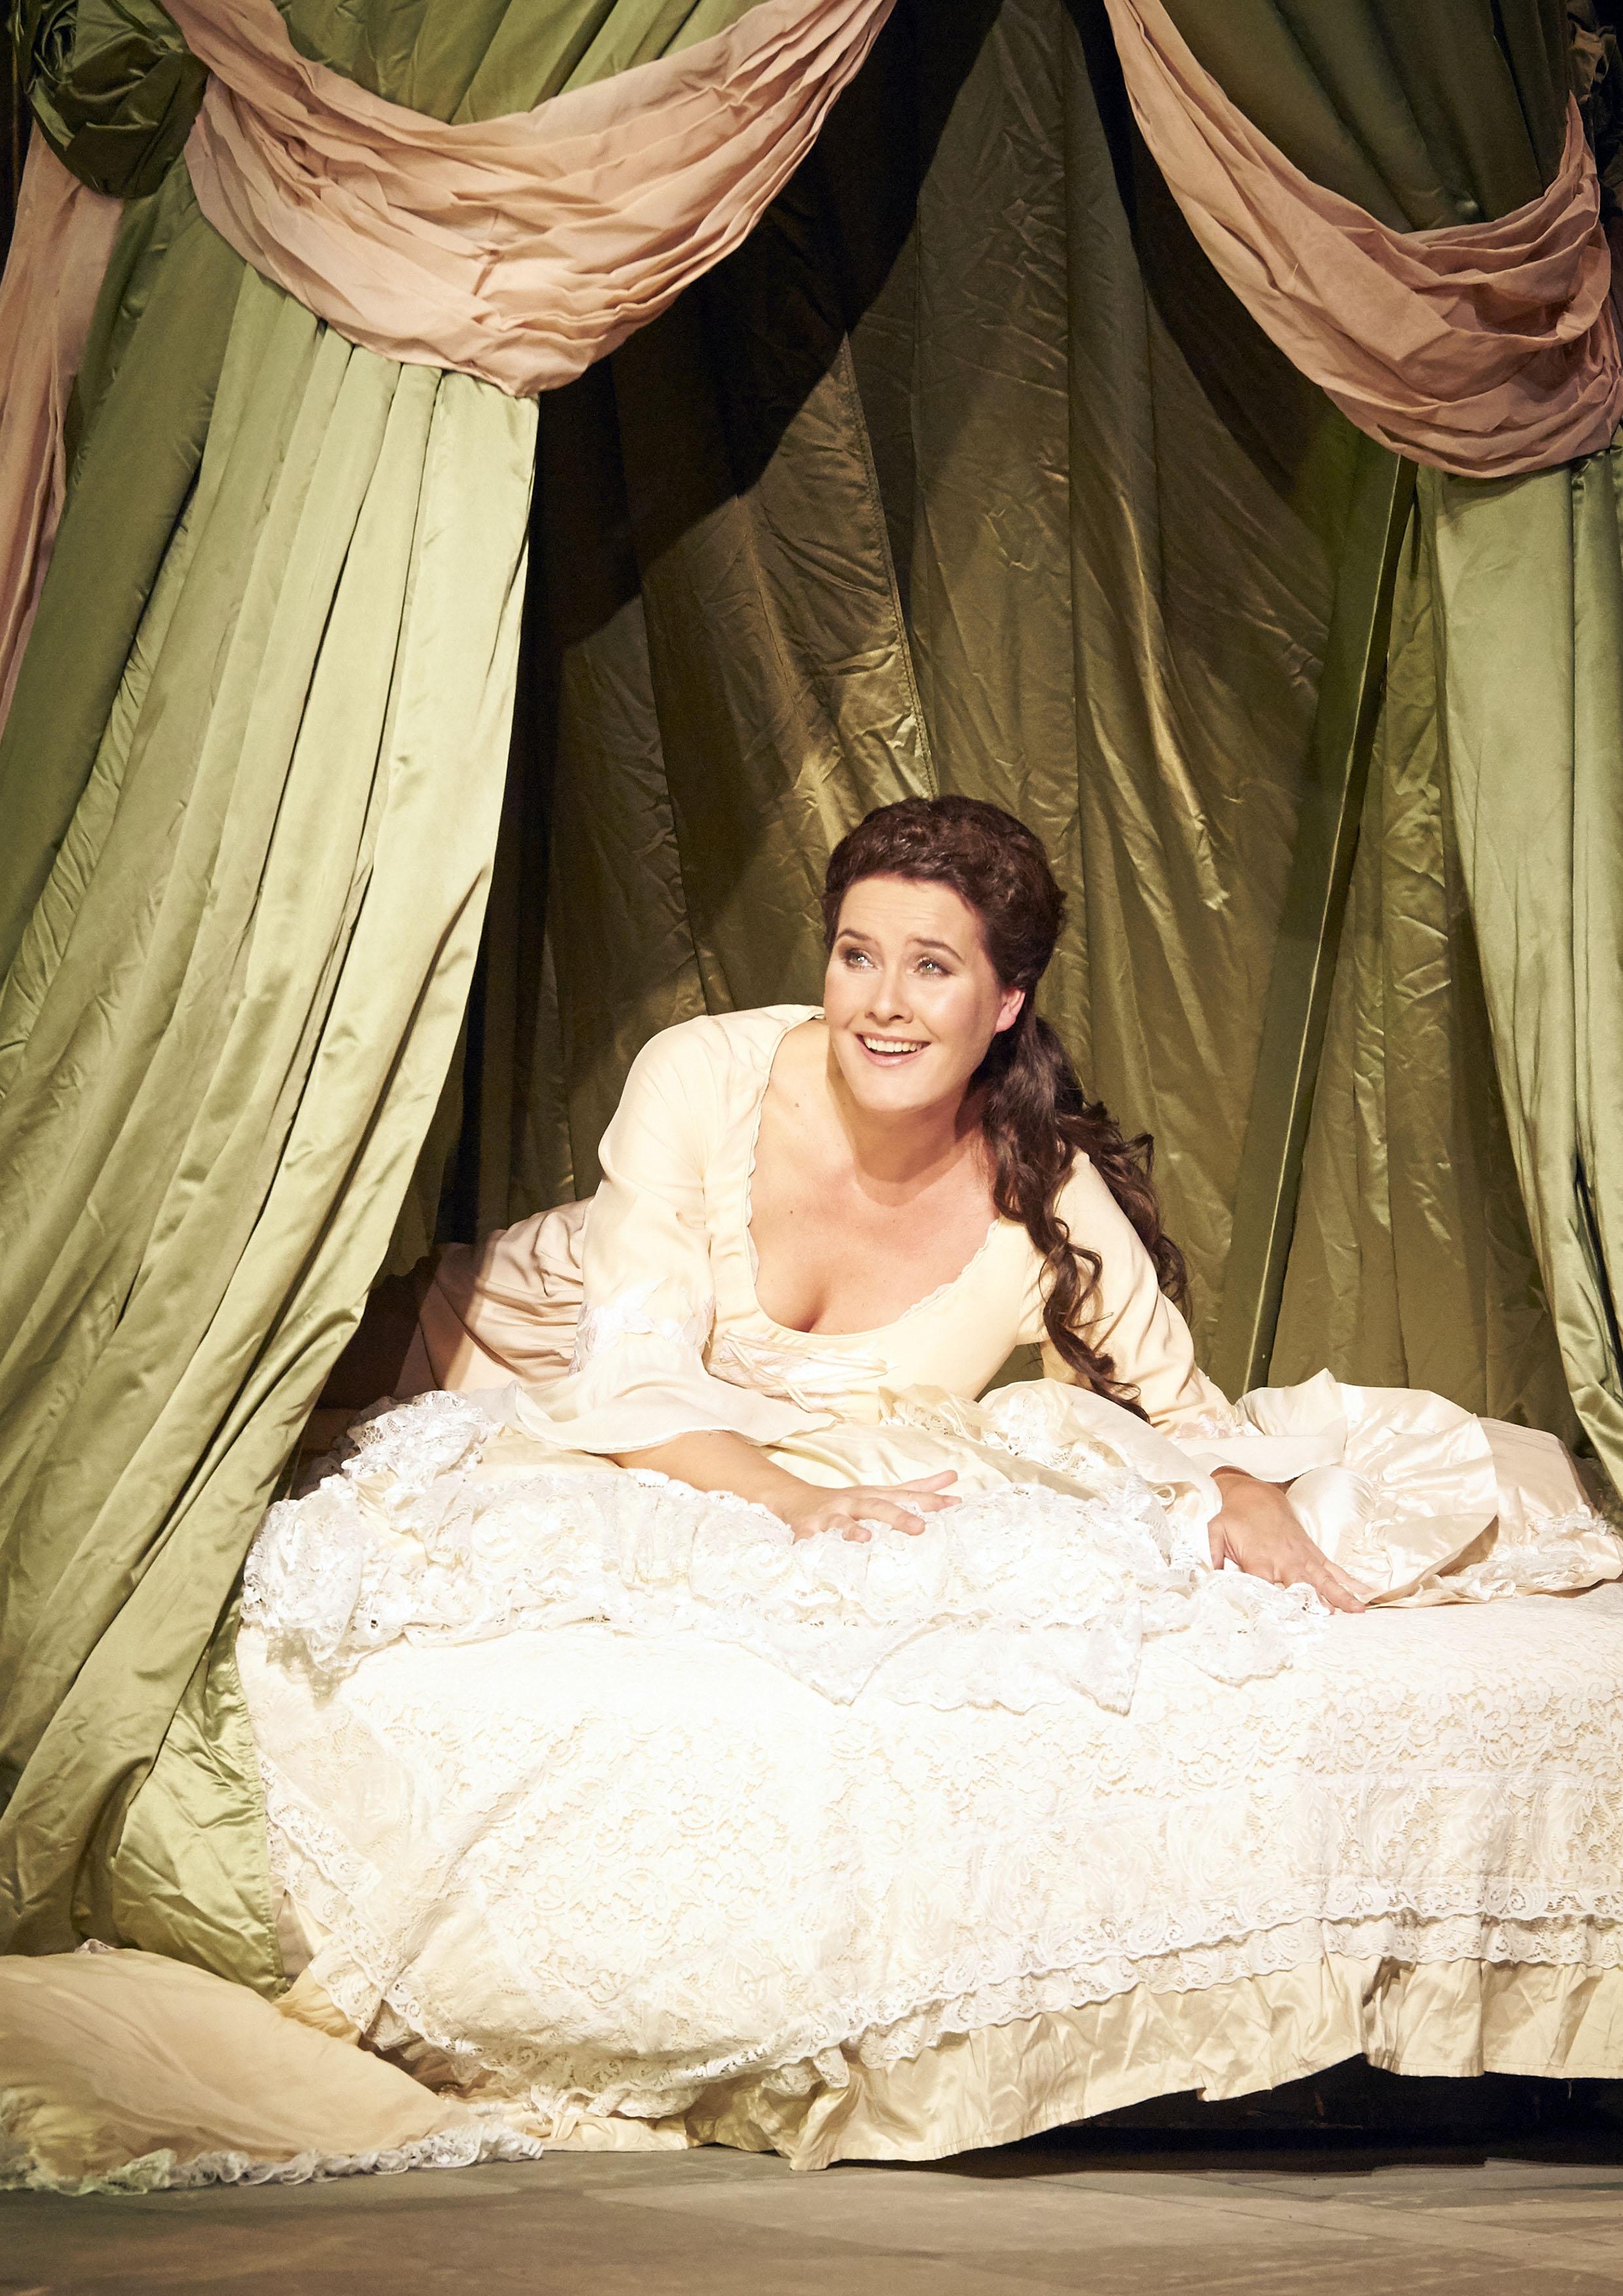 Der Rosenkavalier, Wiener Staatsoper